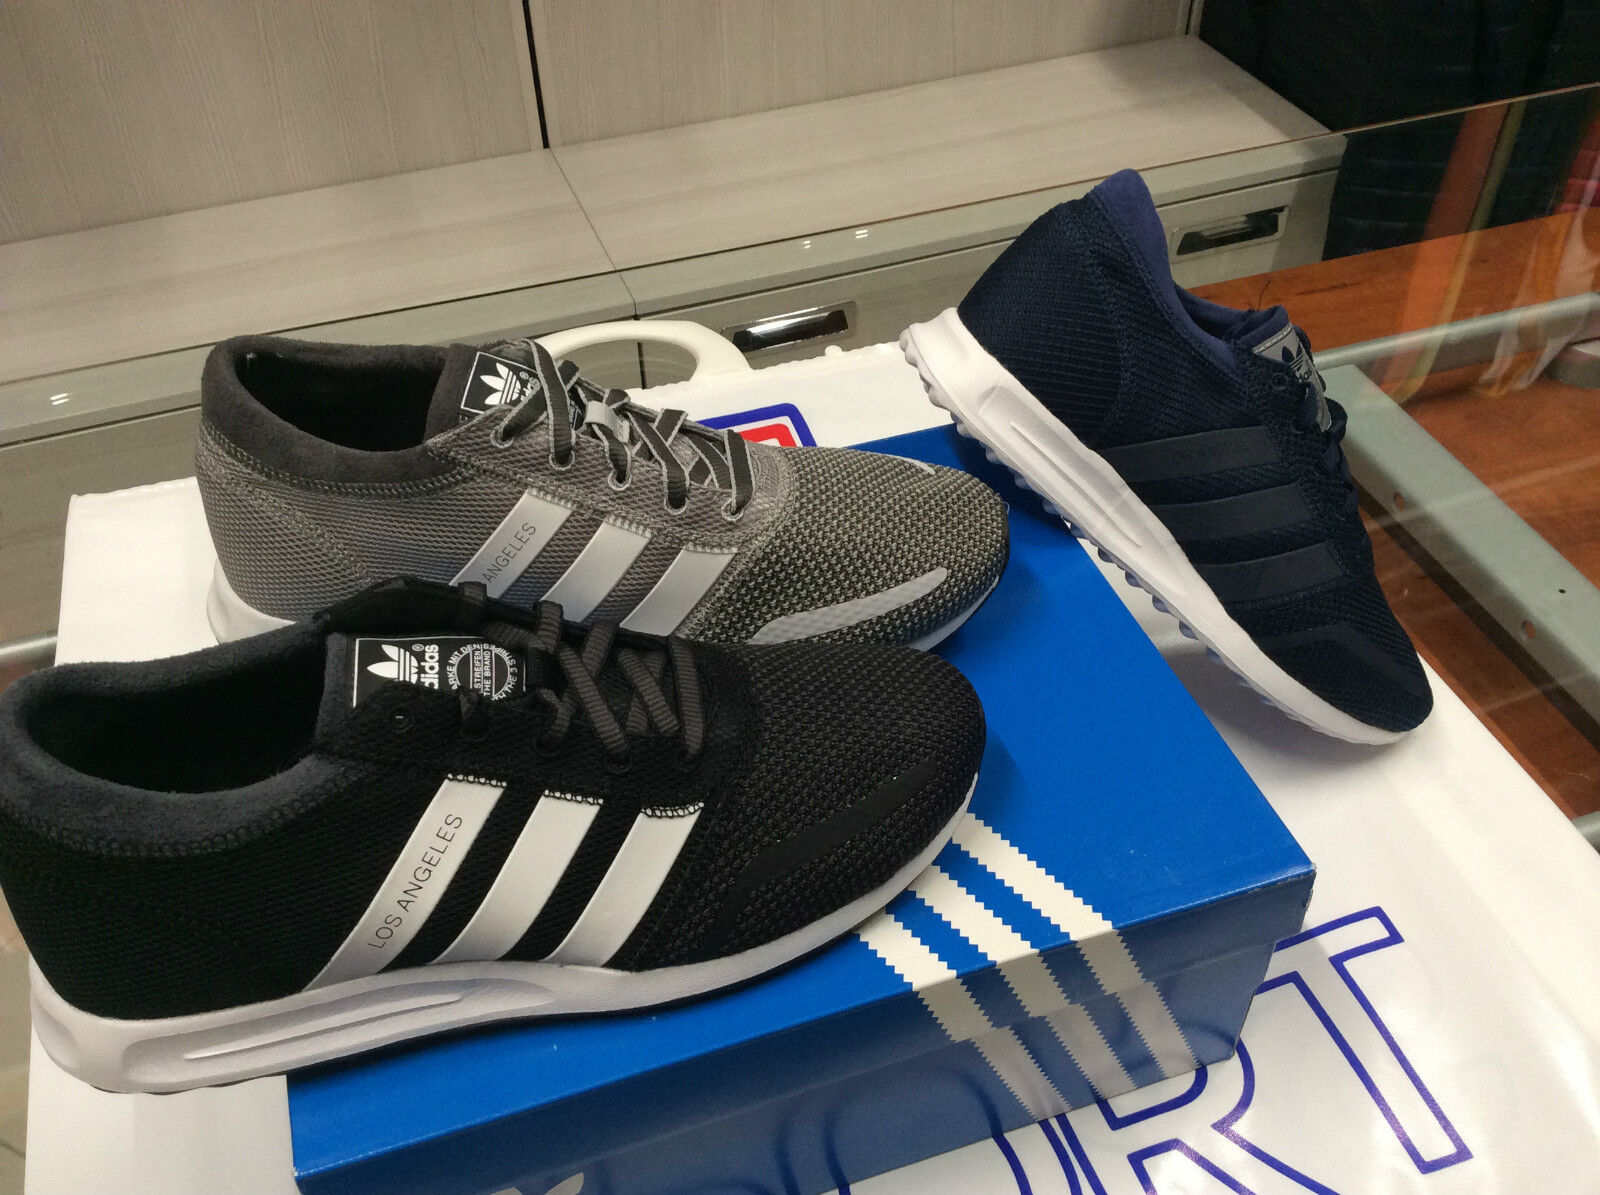 chaussure homme adidas los angeles s31532blu art.s79025grigio aq3199nero s79020 / s31532blu angeles b3070e